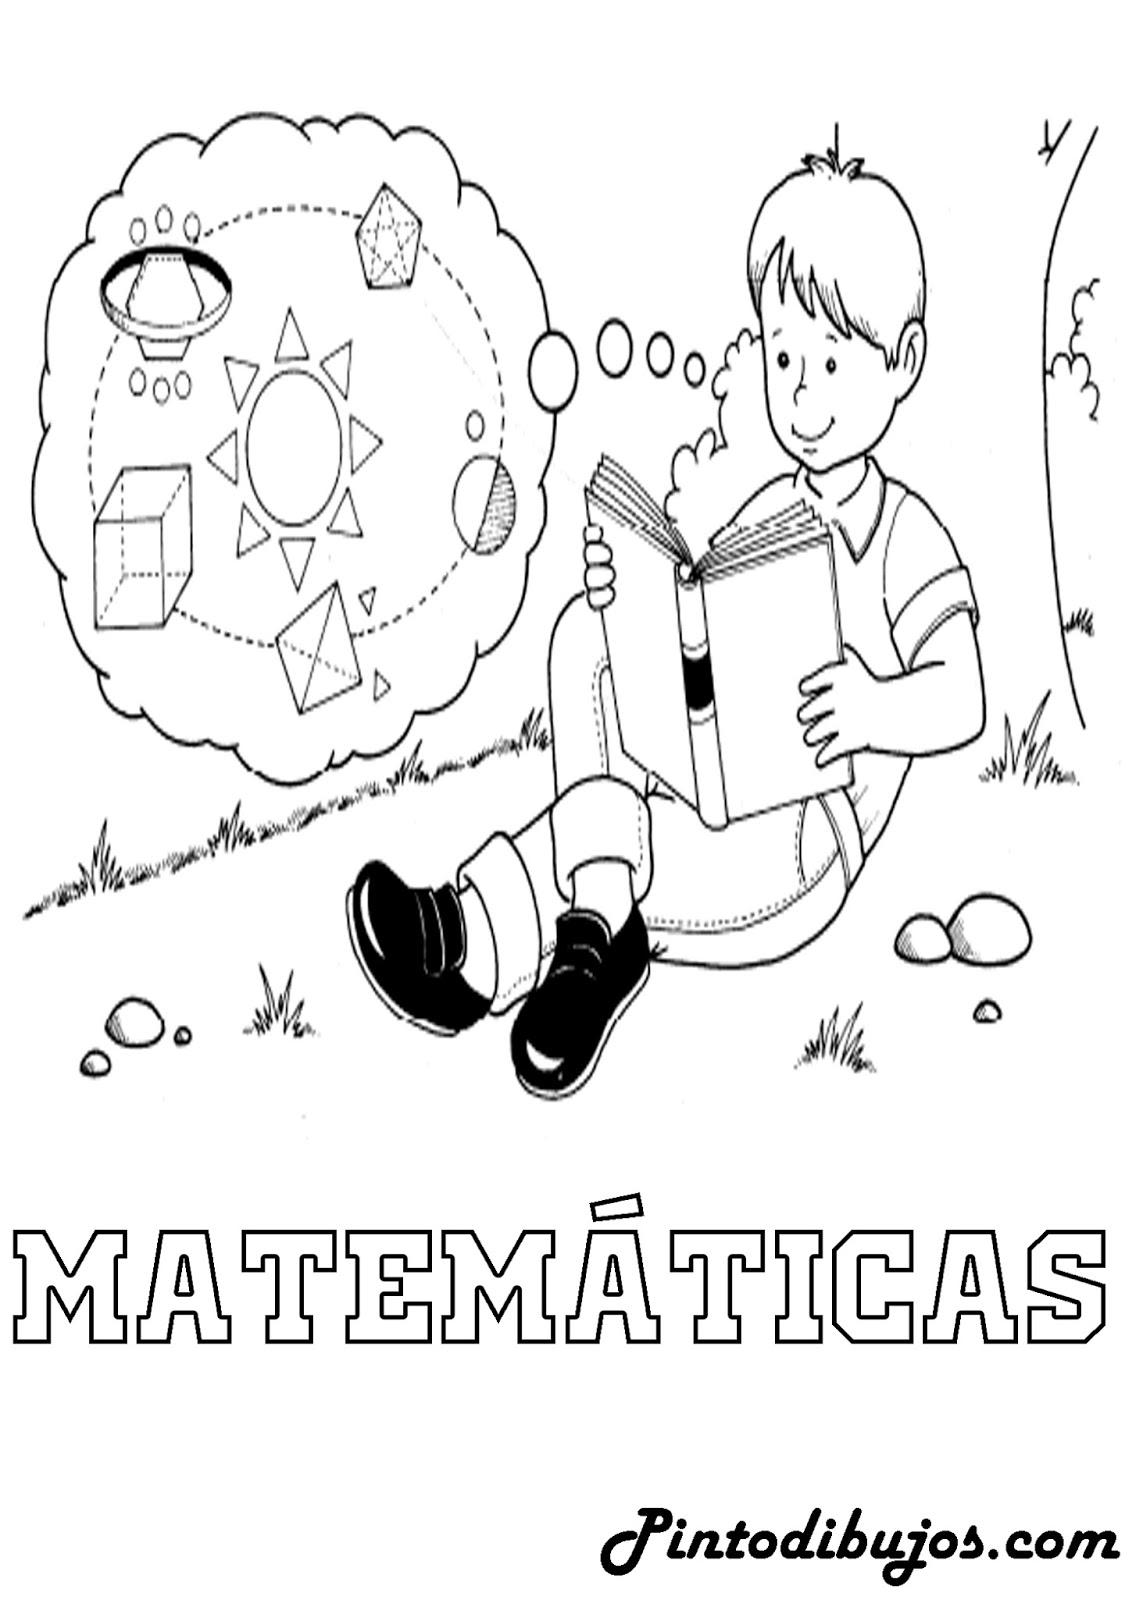 Pinto Dibujos: Matematicas para colorear